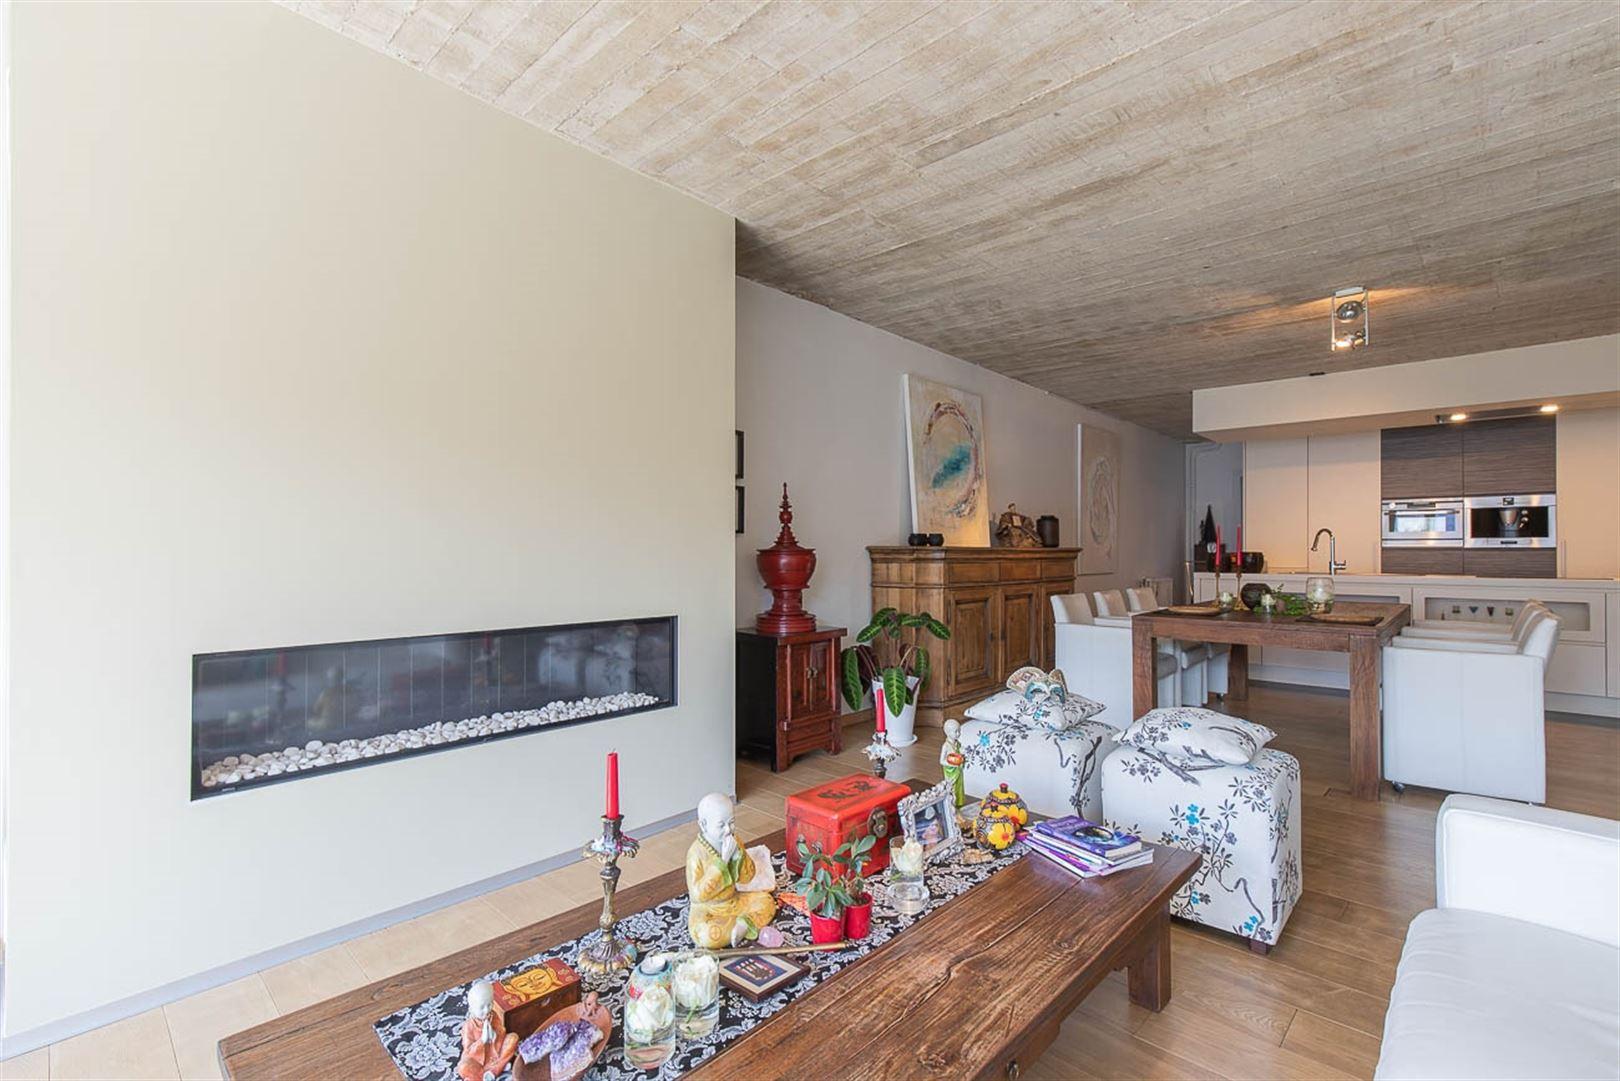 Foto 6 : Duplex/triplex te 9200 DENDERMONDE (België) - Prijs € 495.000